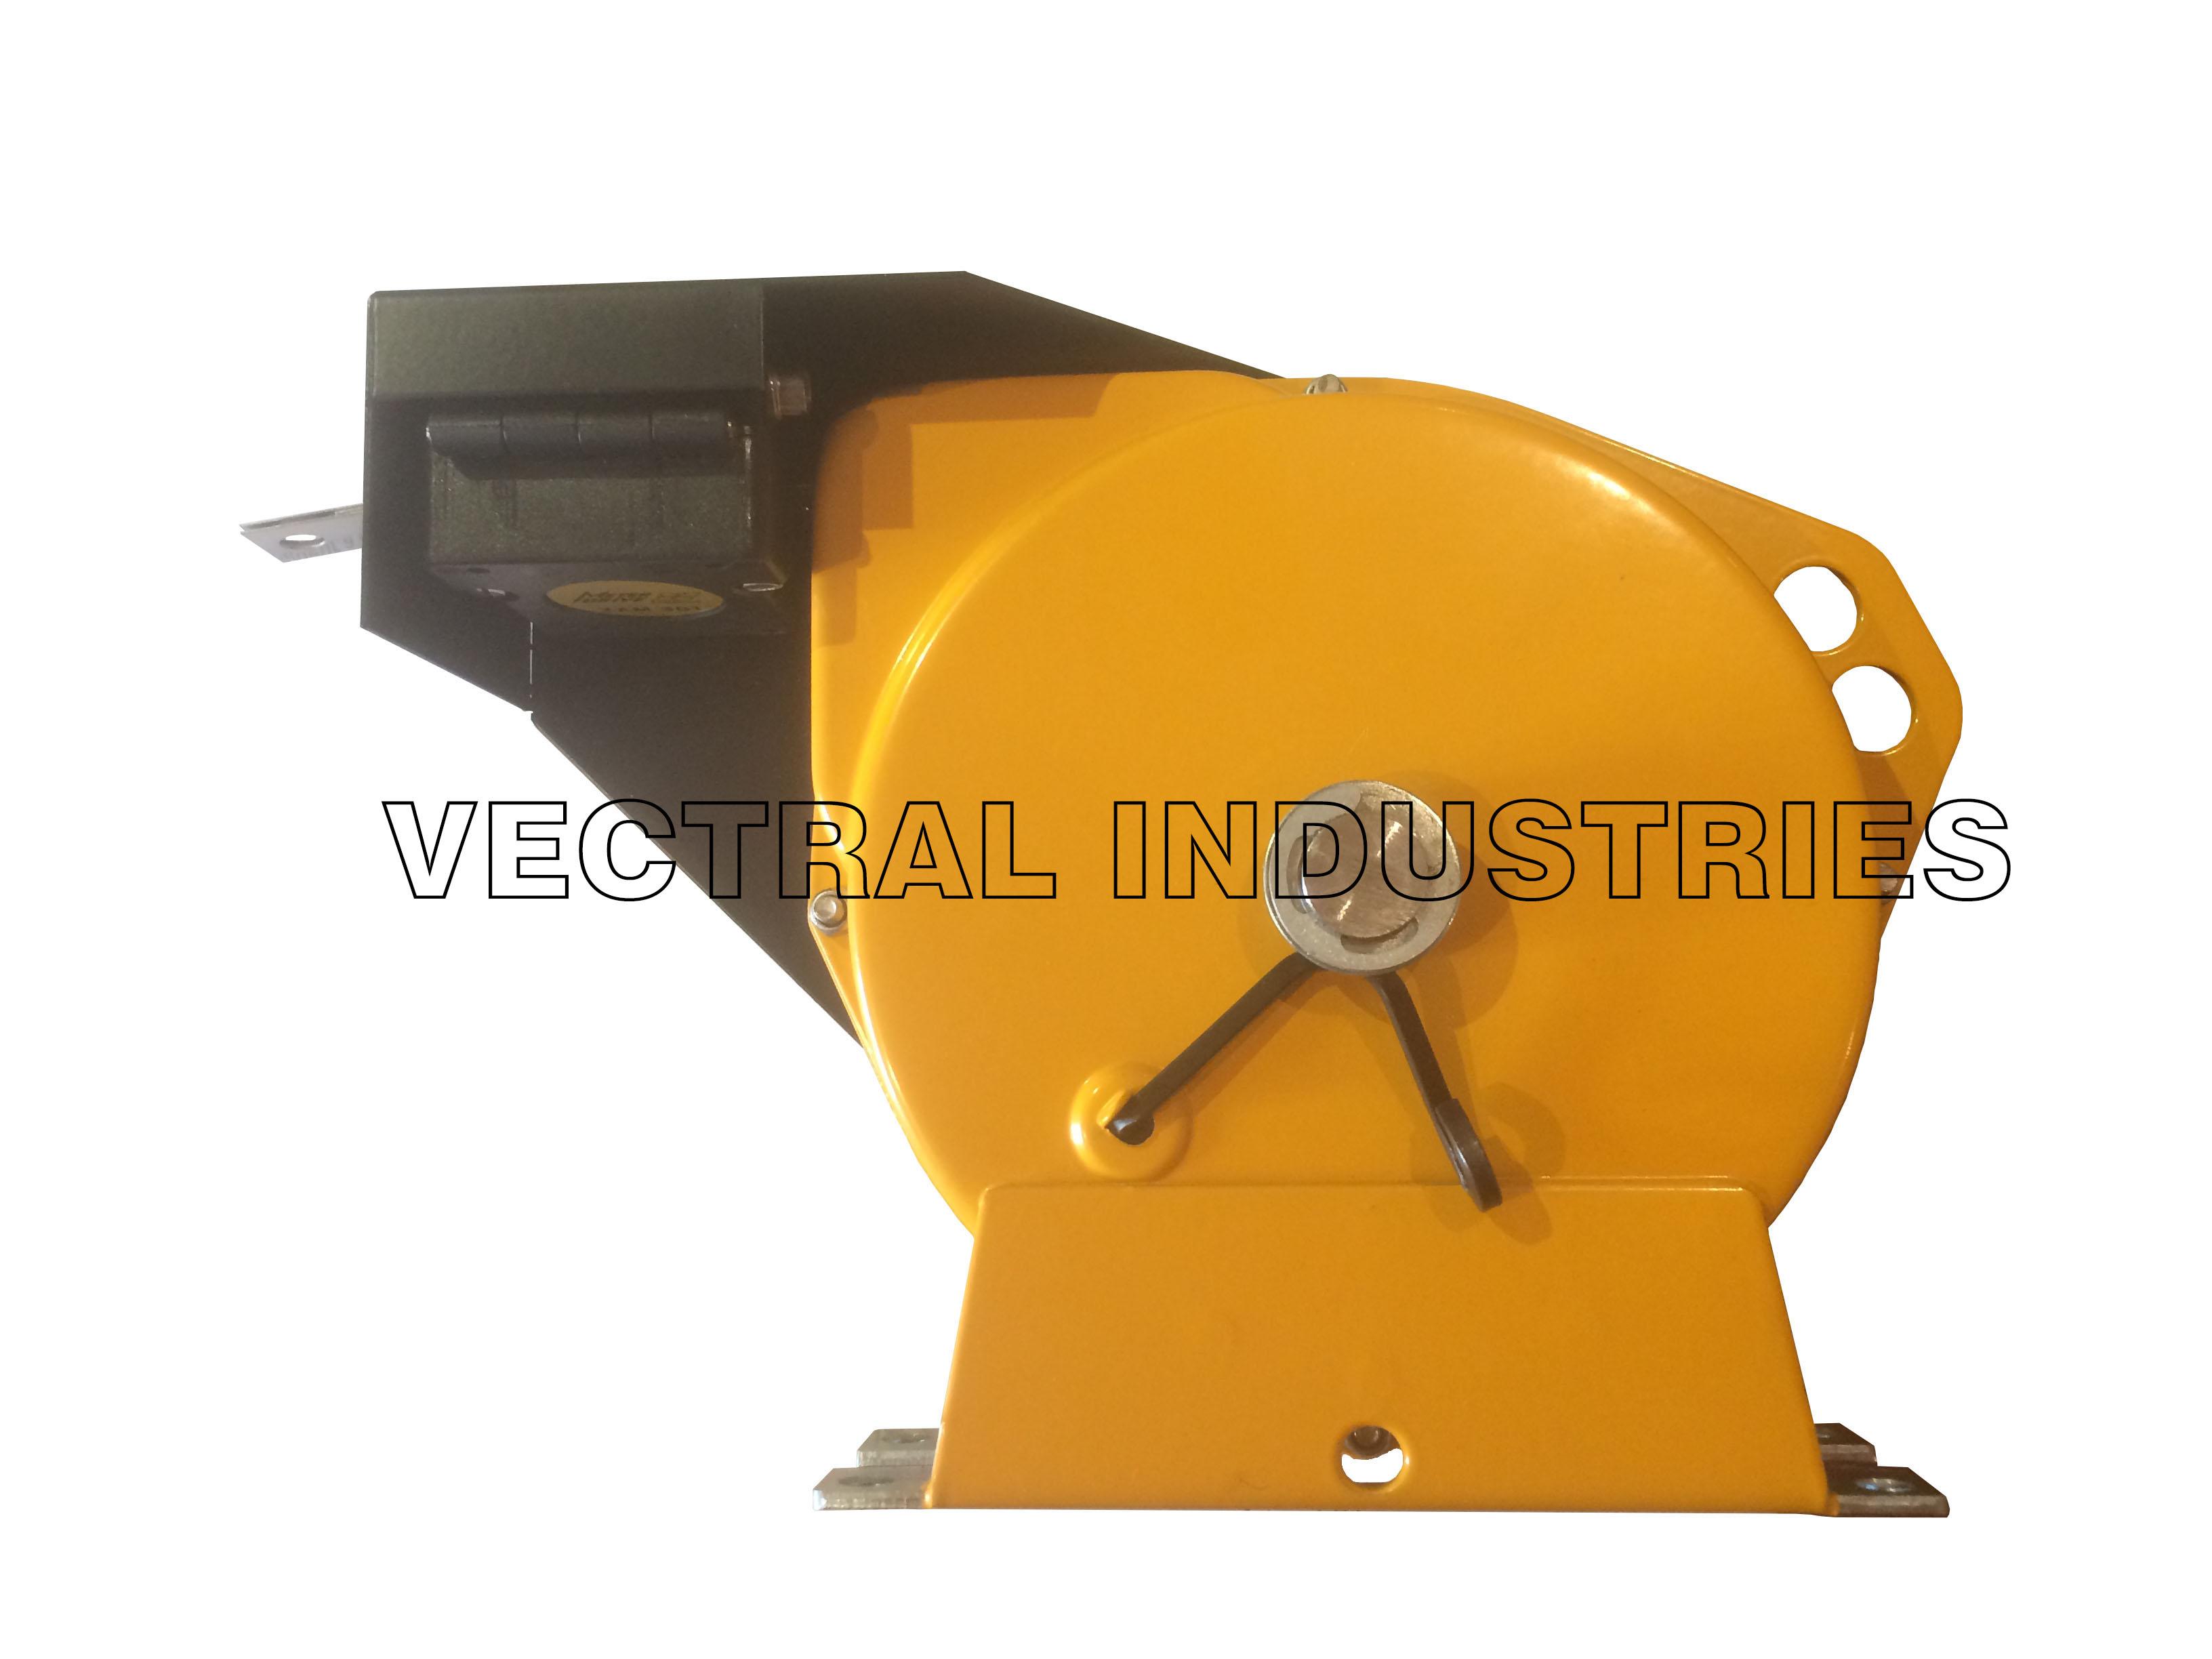 Rollzam Vectral Industries